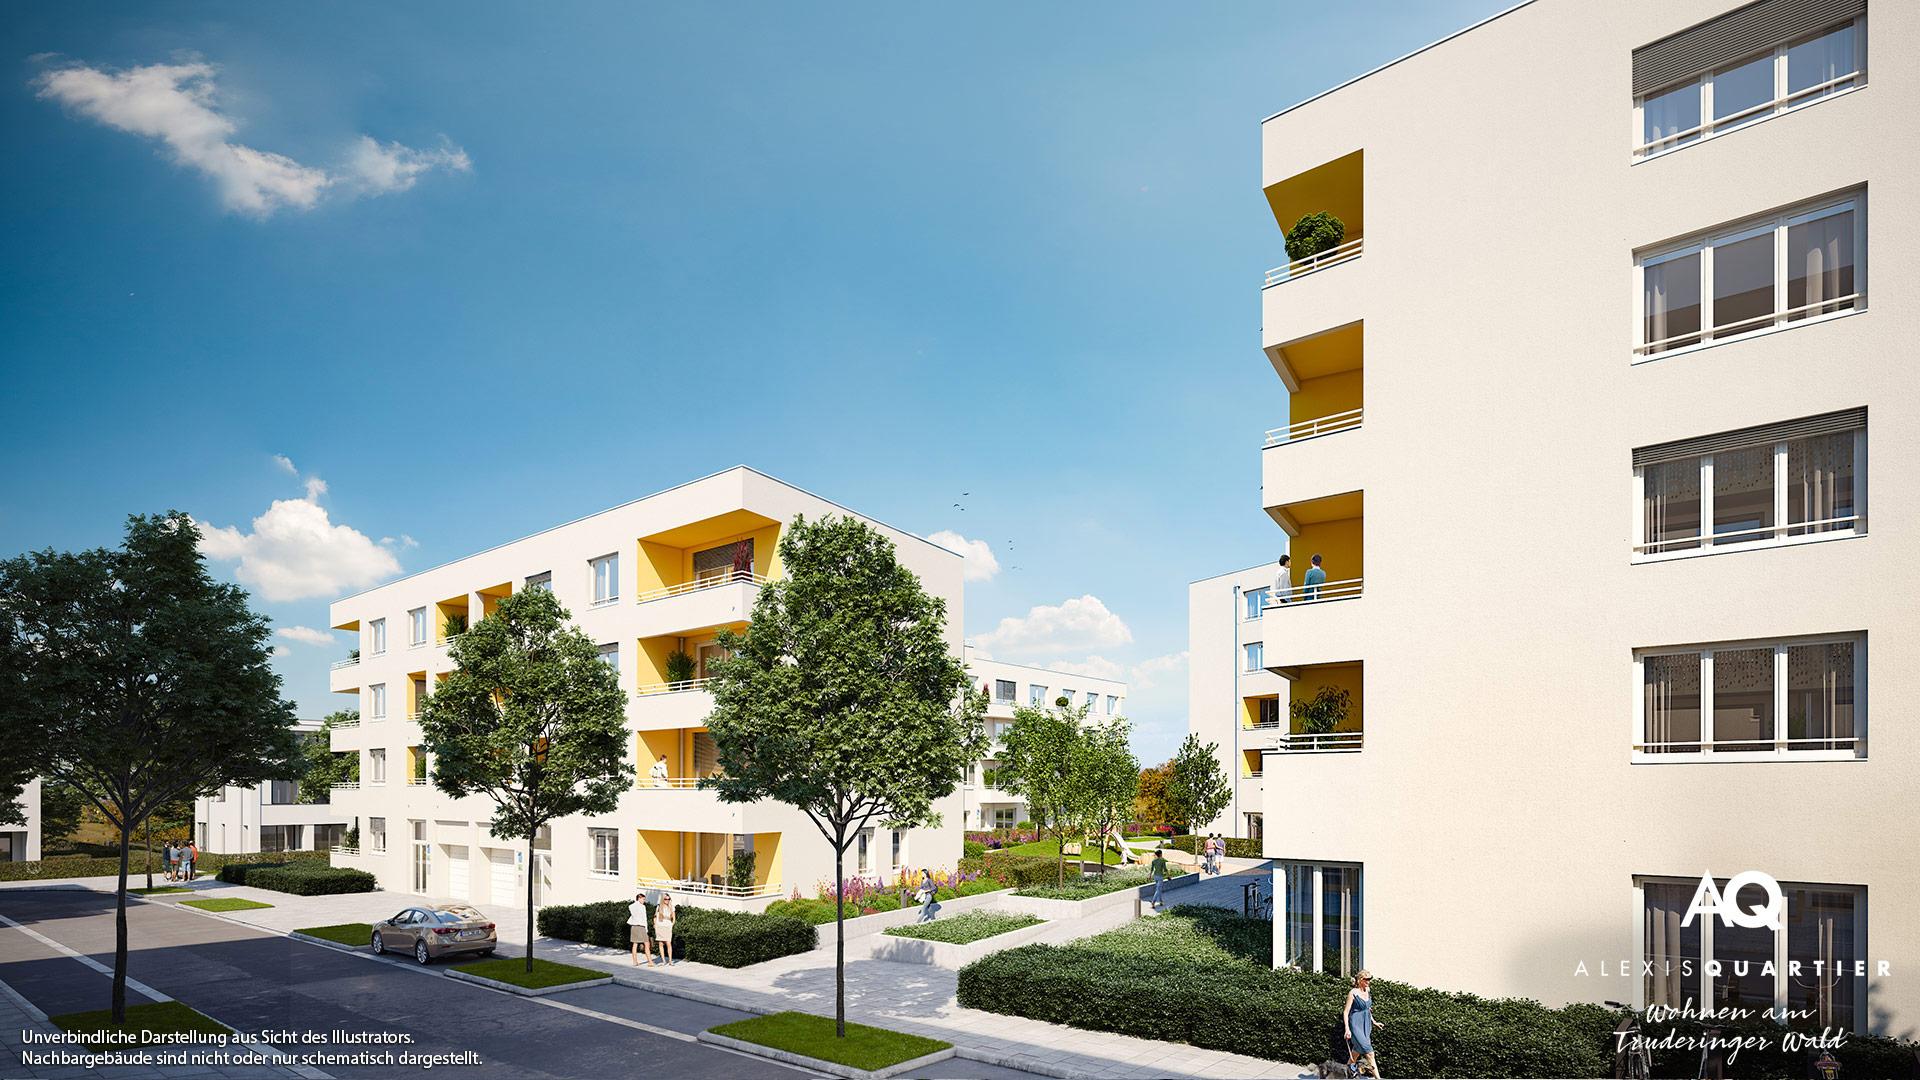 Immobilie Alexisquartier - Wohnen am Truderinger Wald - Illustration 6